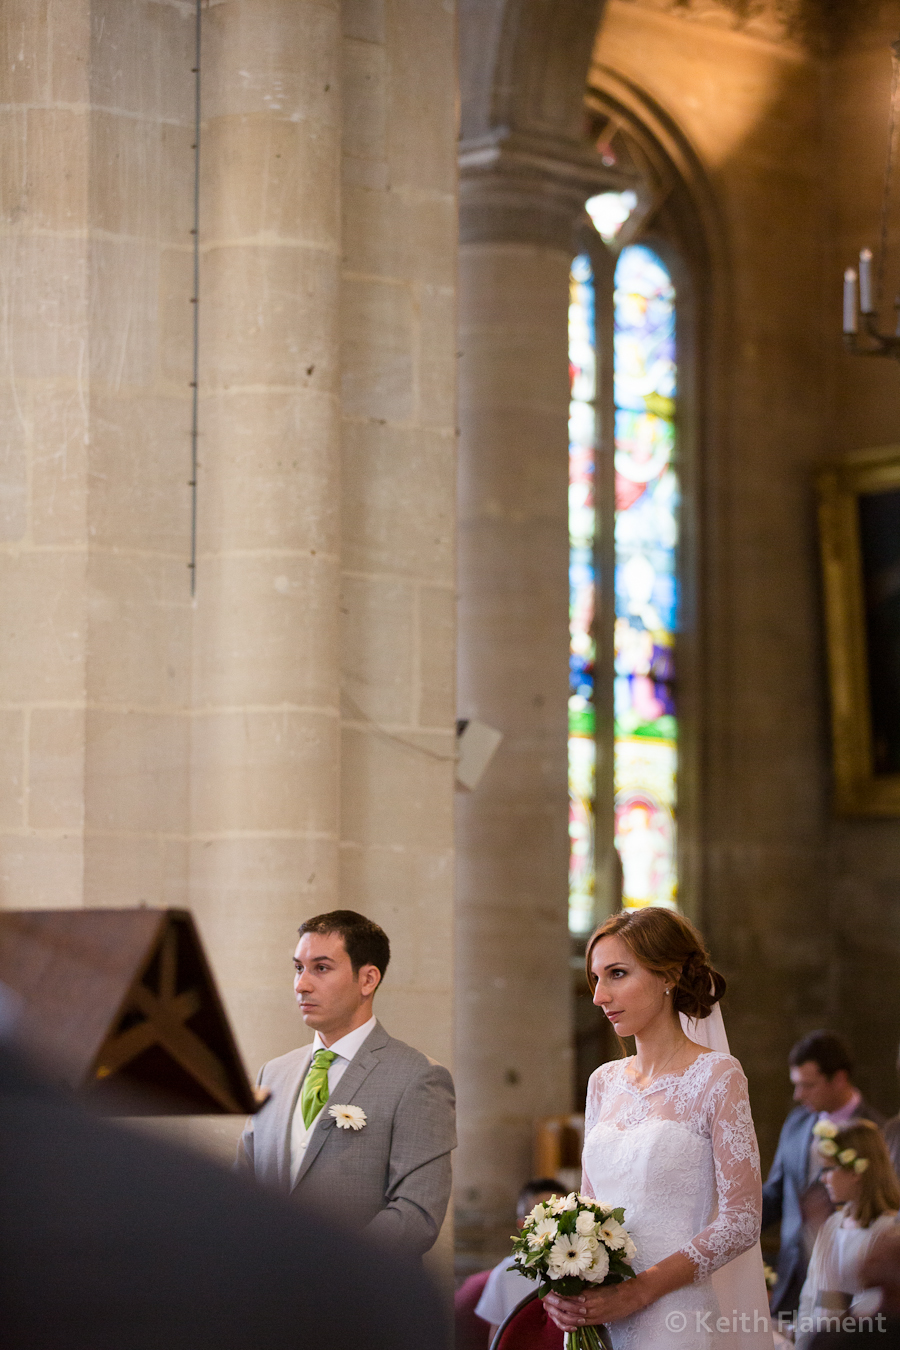 photographe-reportage-mariage-keith-flament-chateau-aveny-bourgogne-21